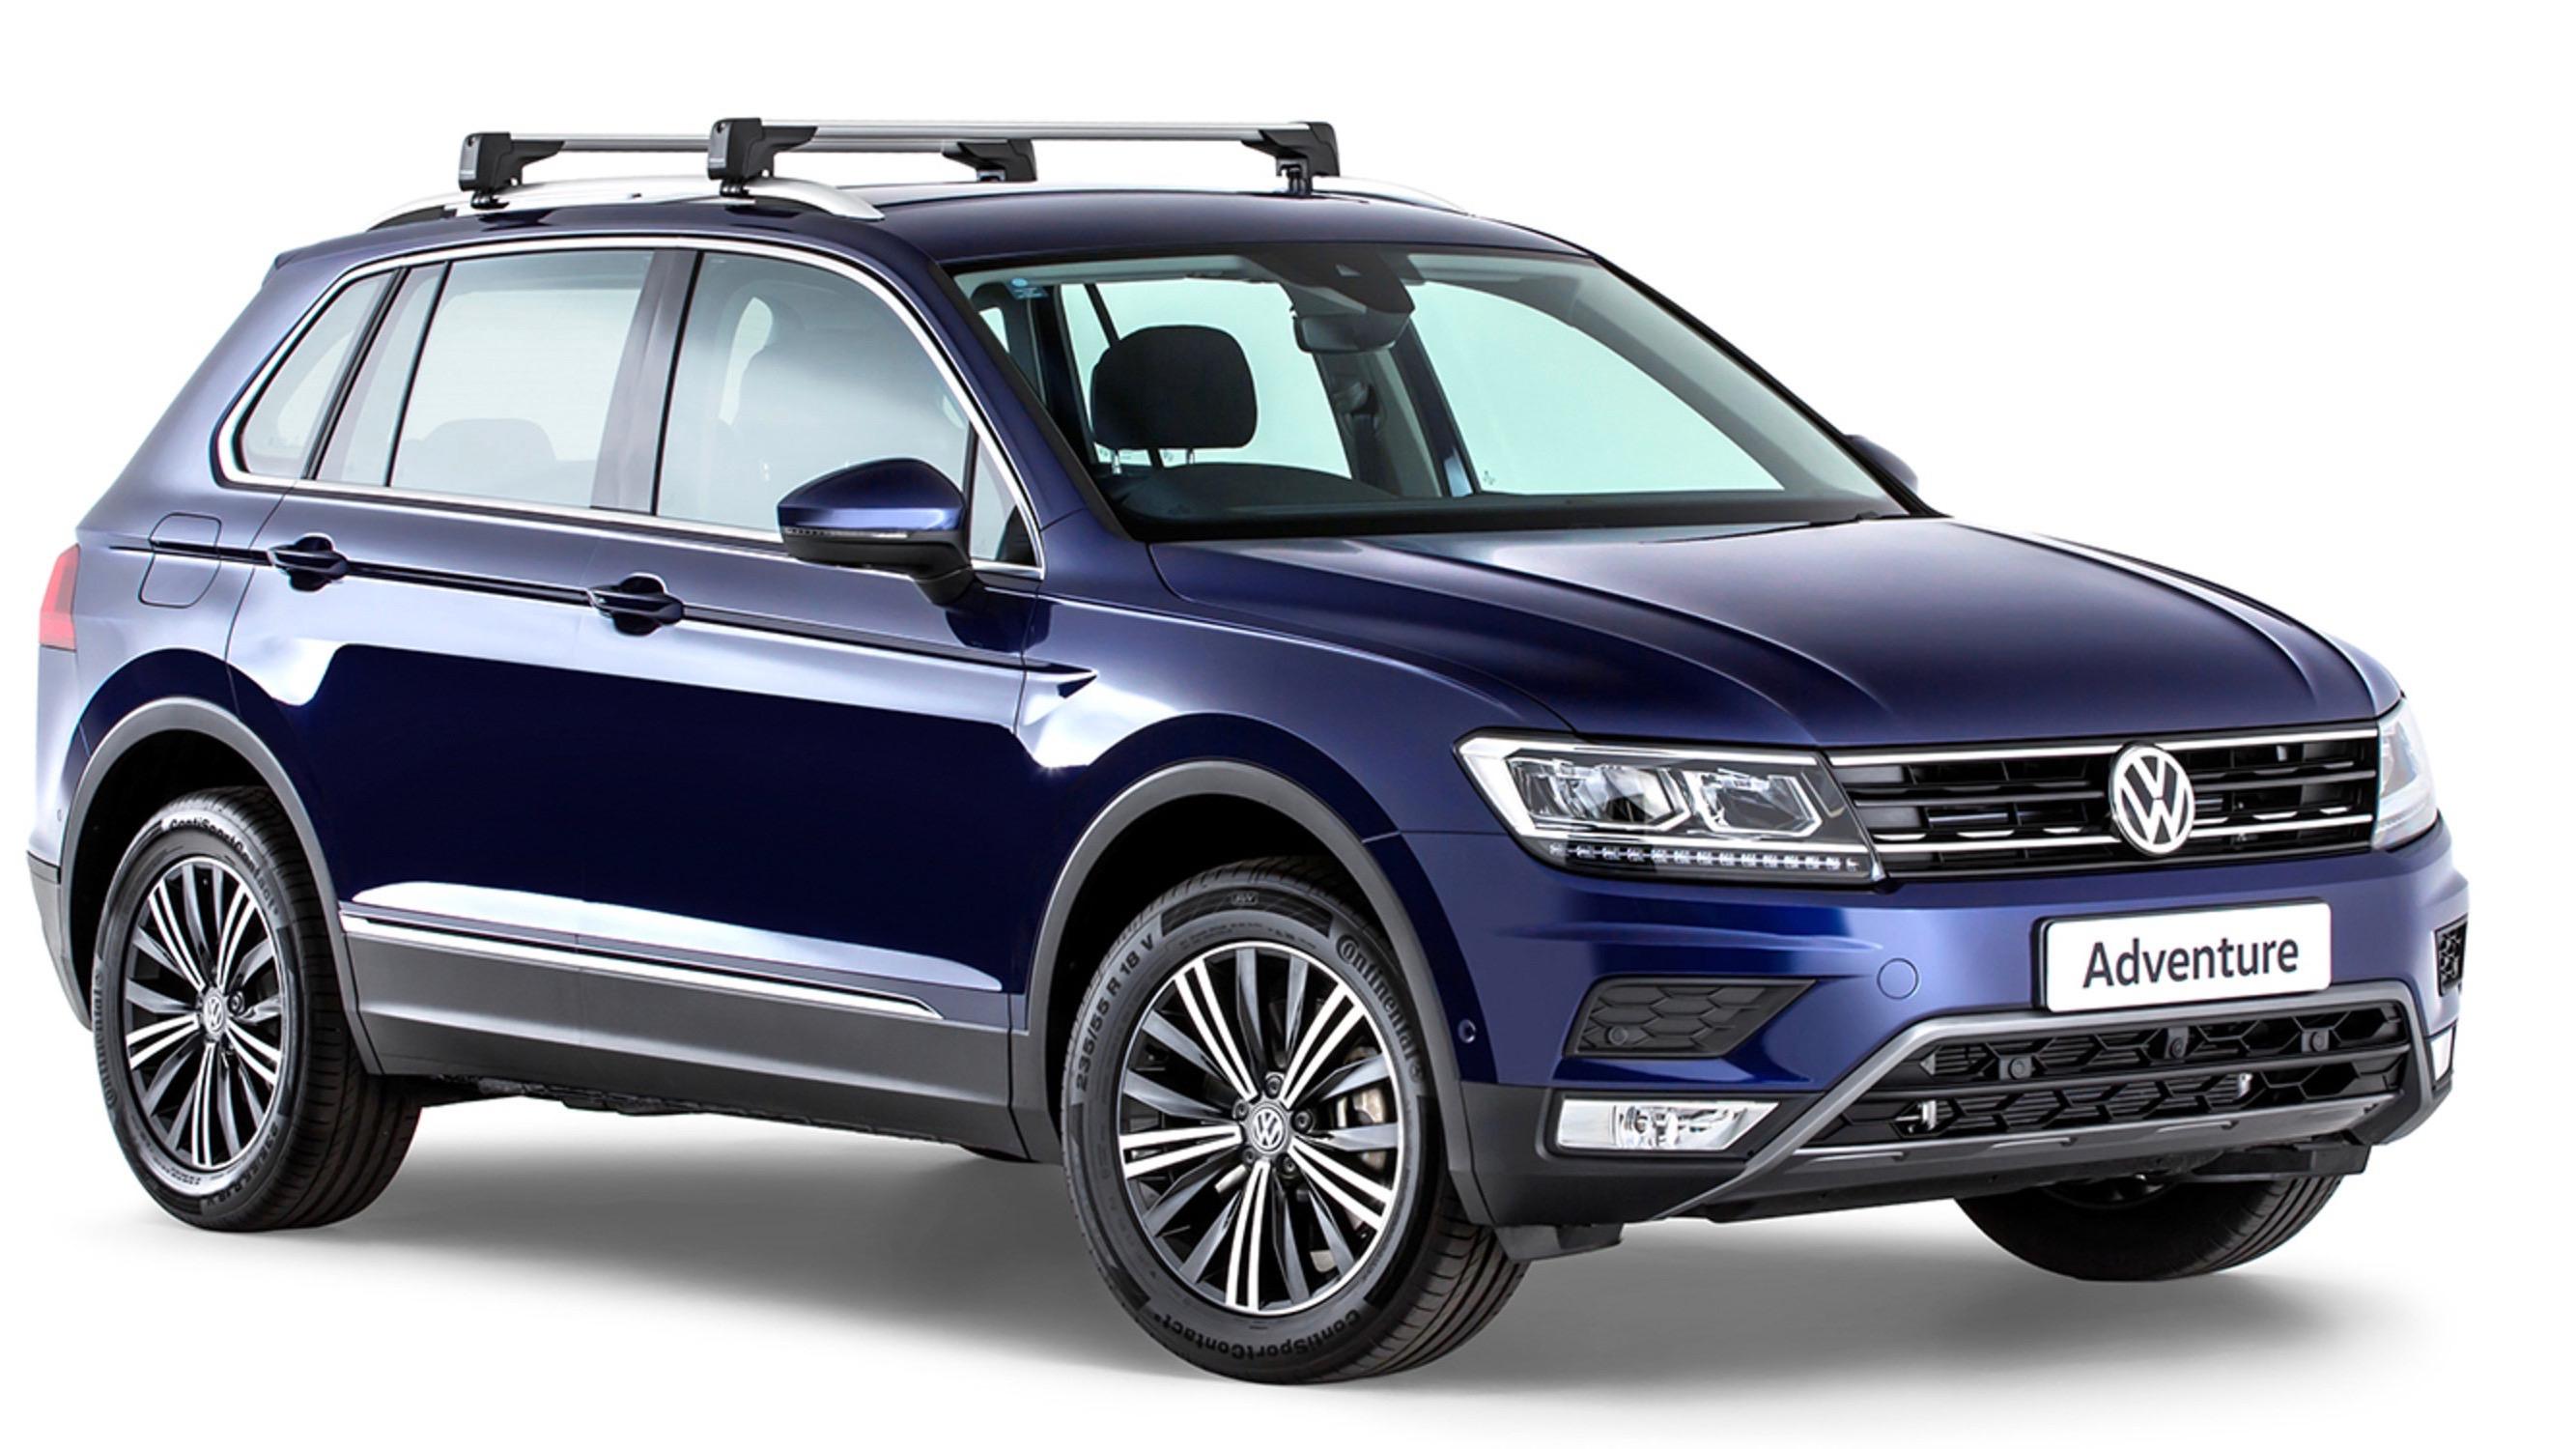 2017 Volkswagen Tiguan Advanture Atlantic Blue front